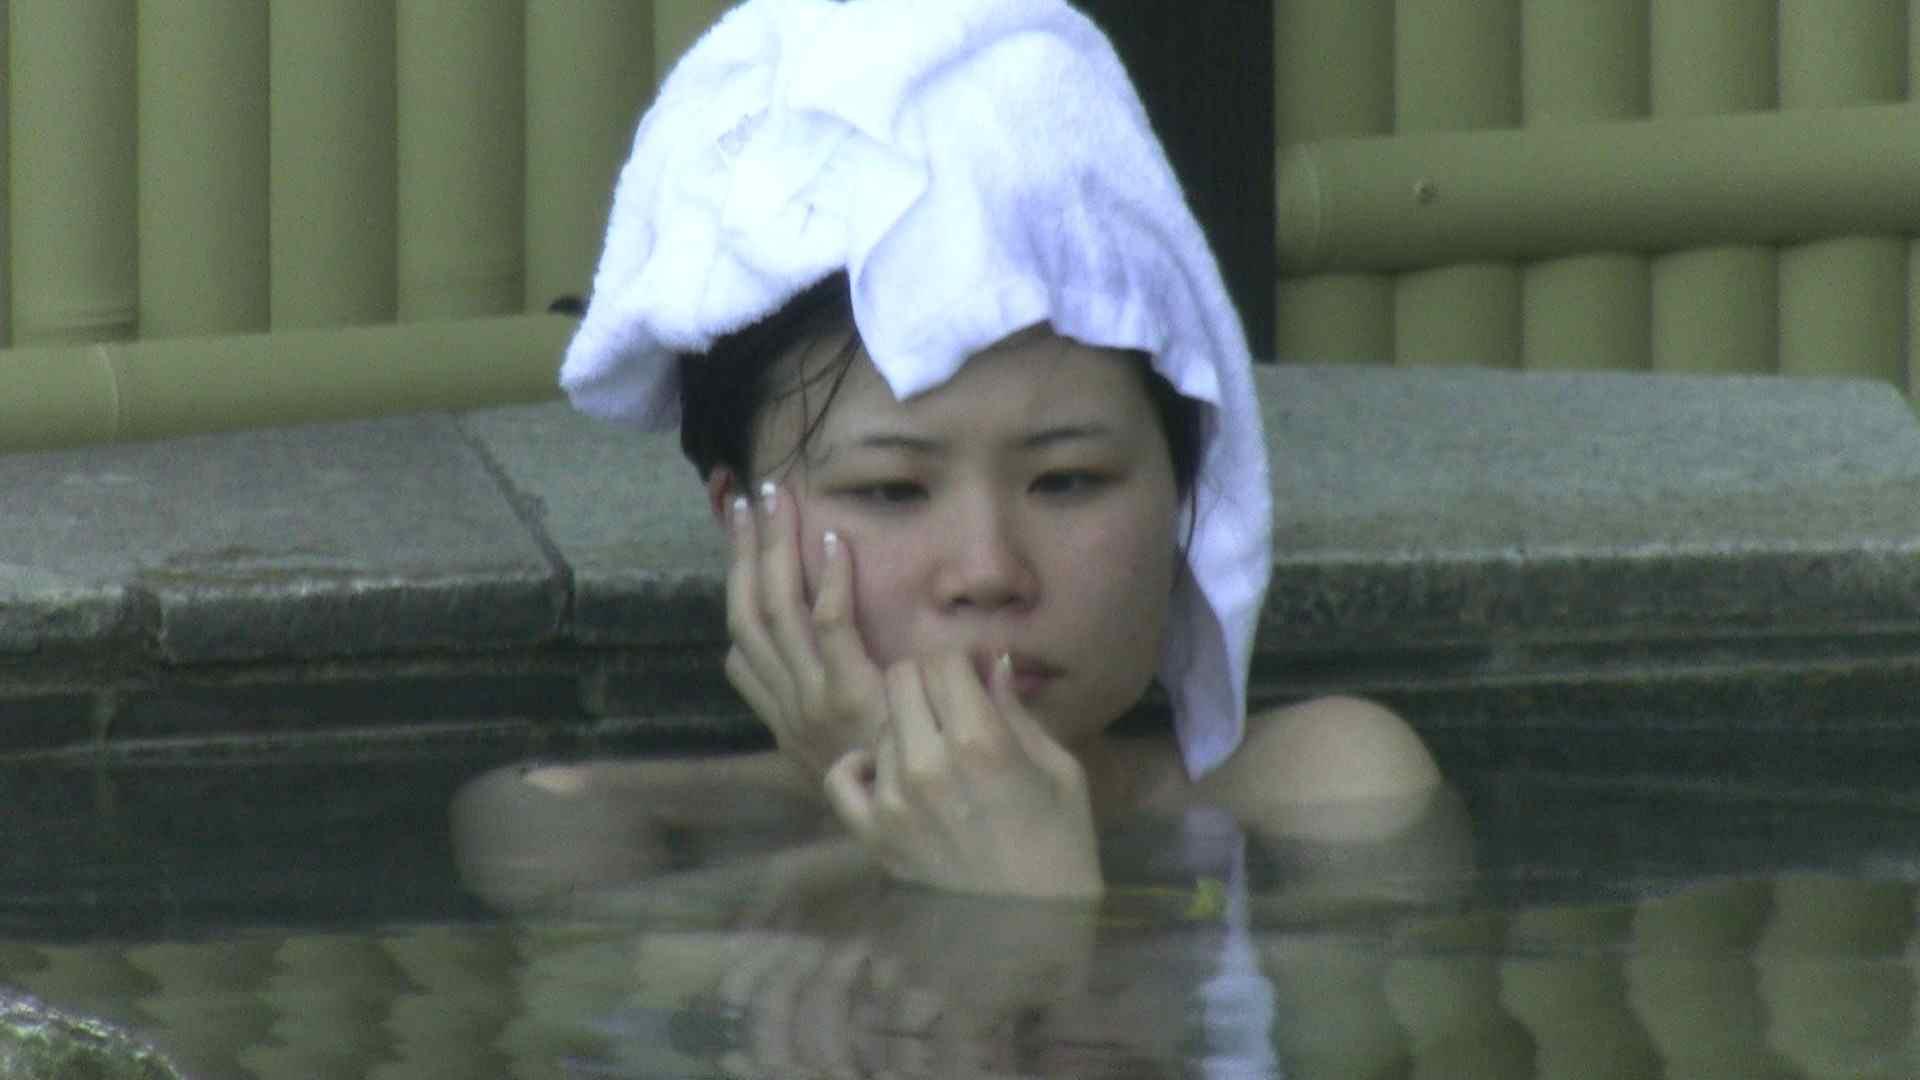 Aquaな露天風呂Vol.183 露天風呂編  104PIX 8